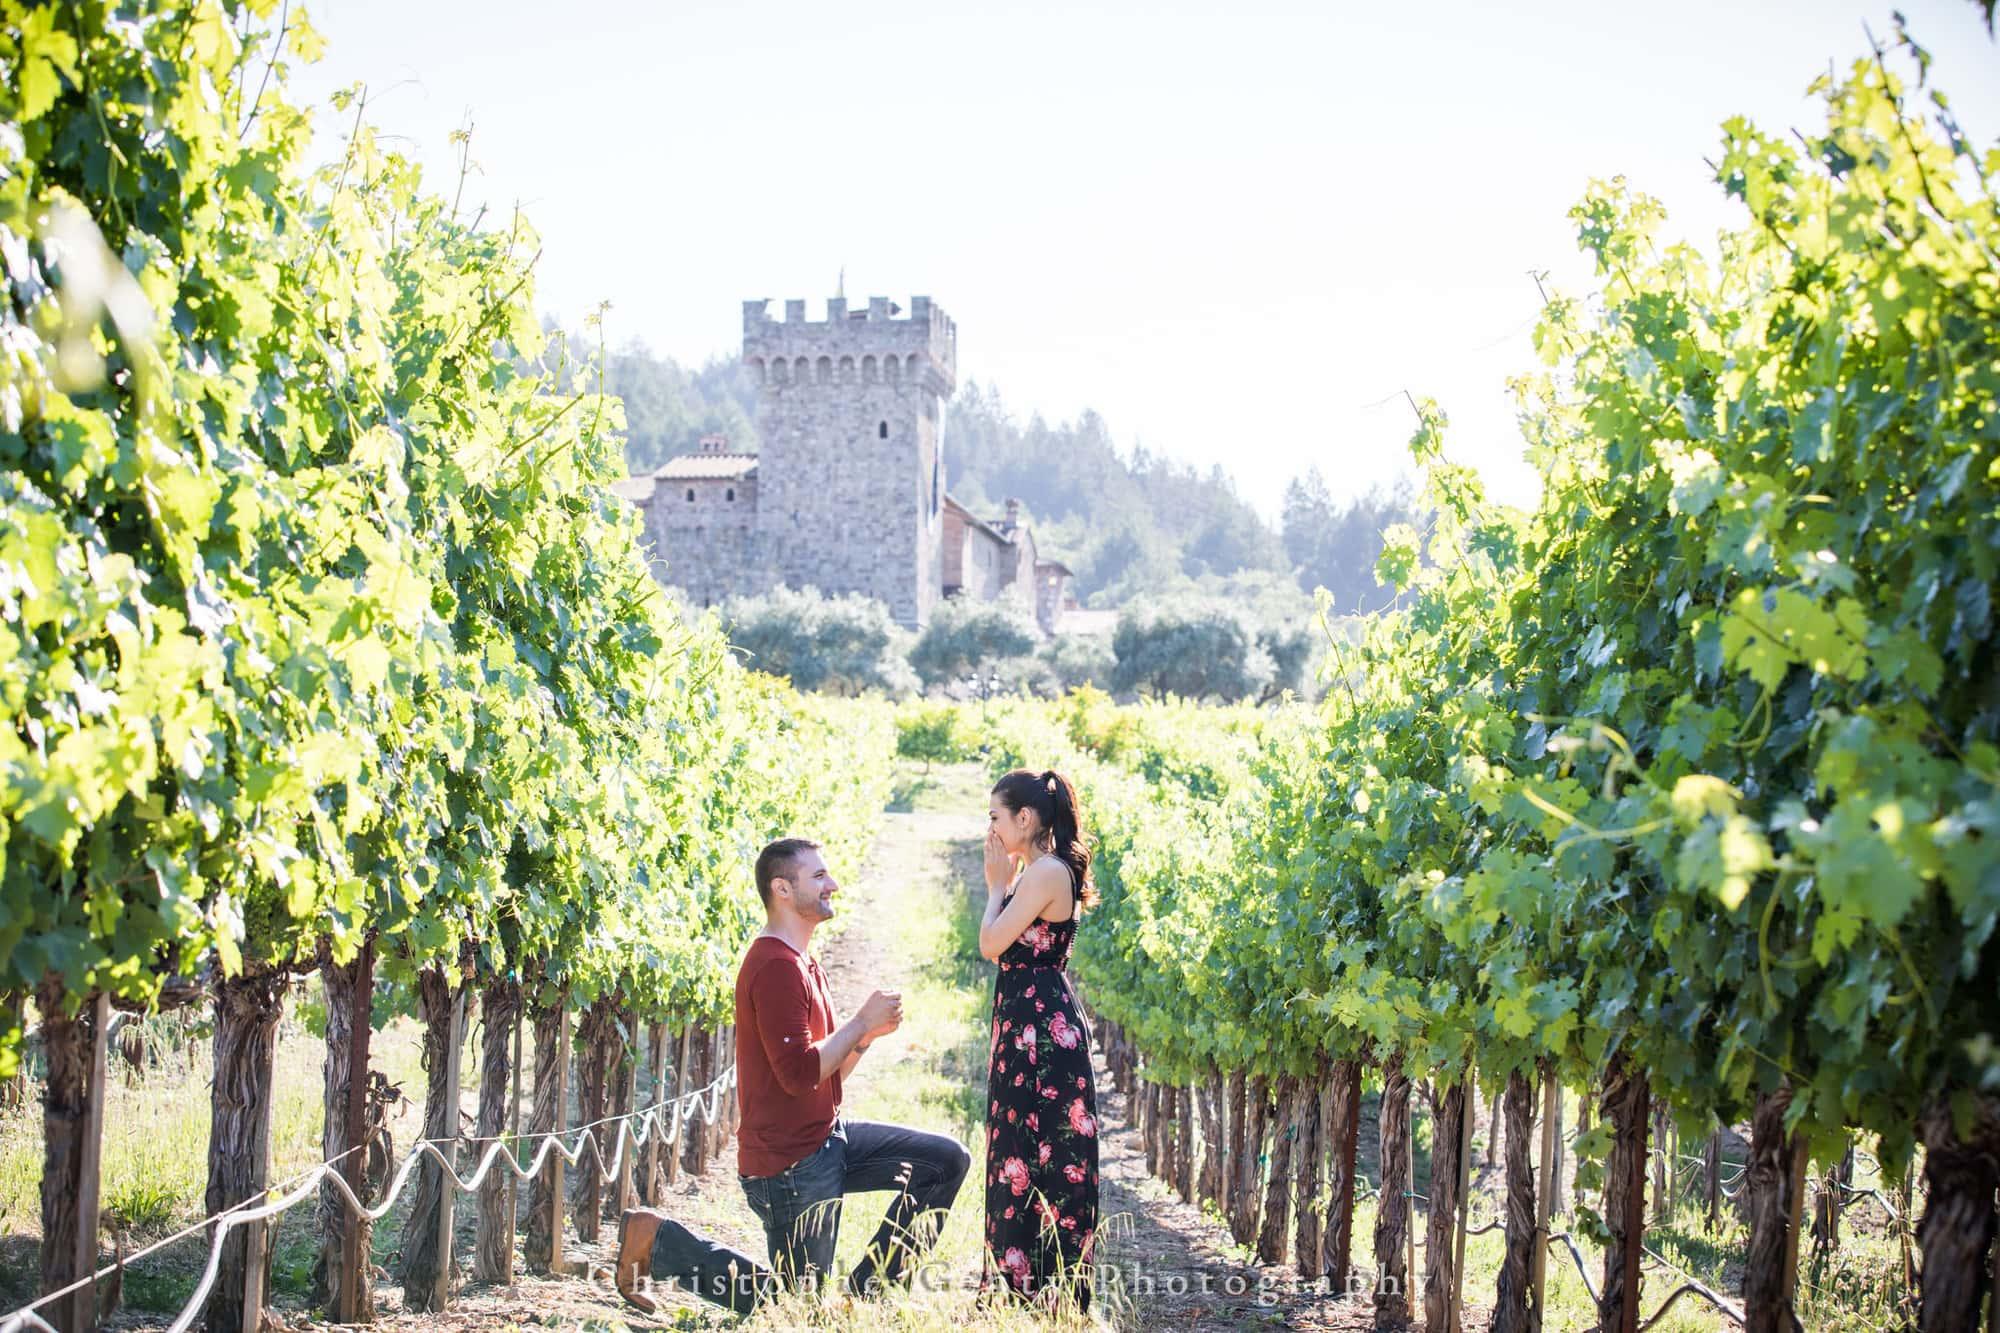 Castello di Amorosa Marriage Proposal Photography 310